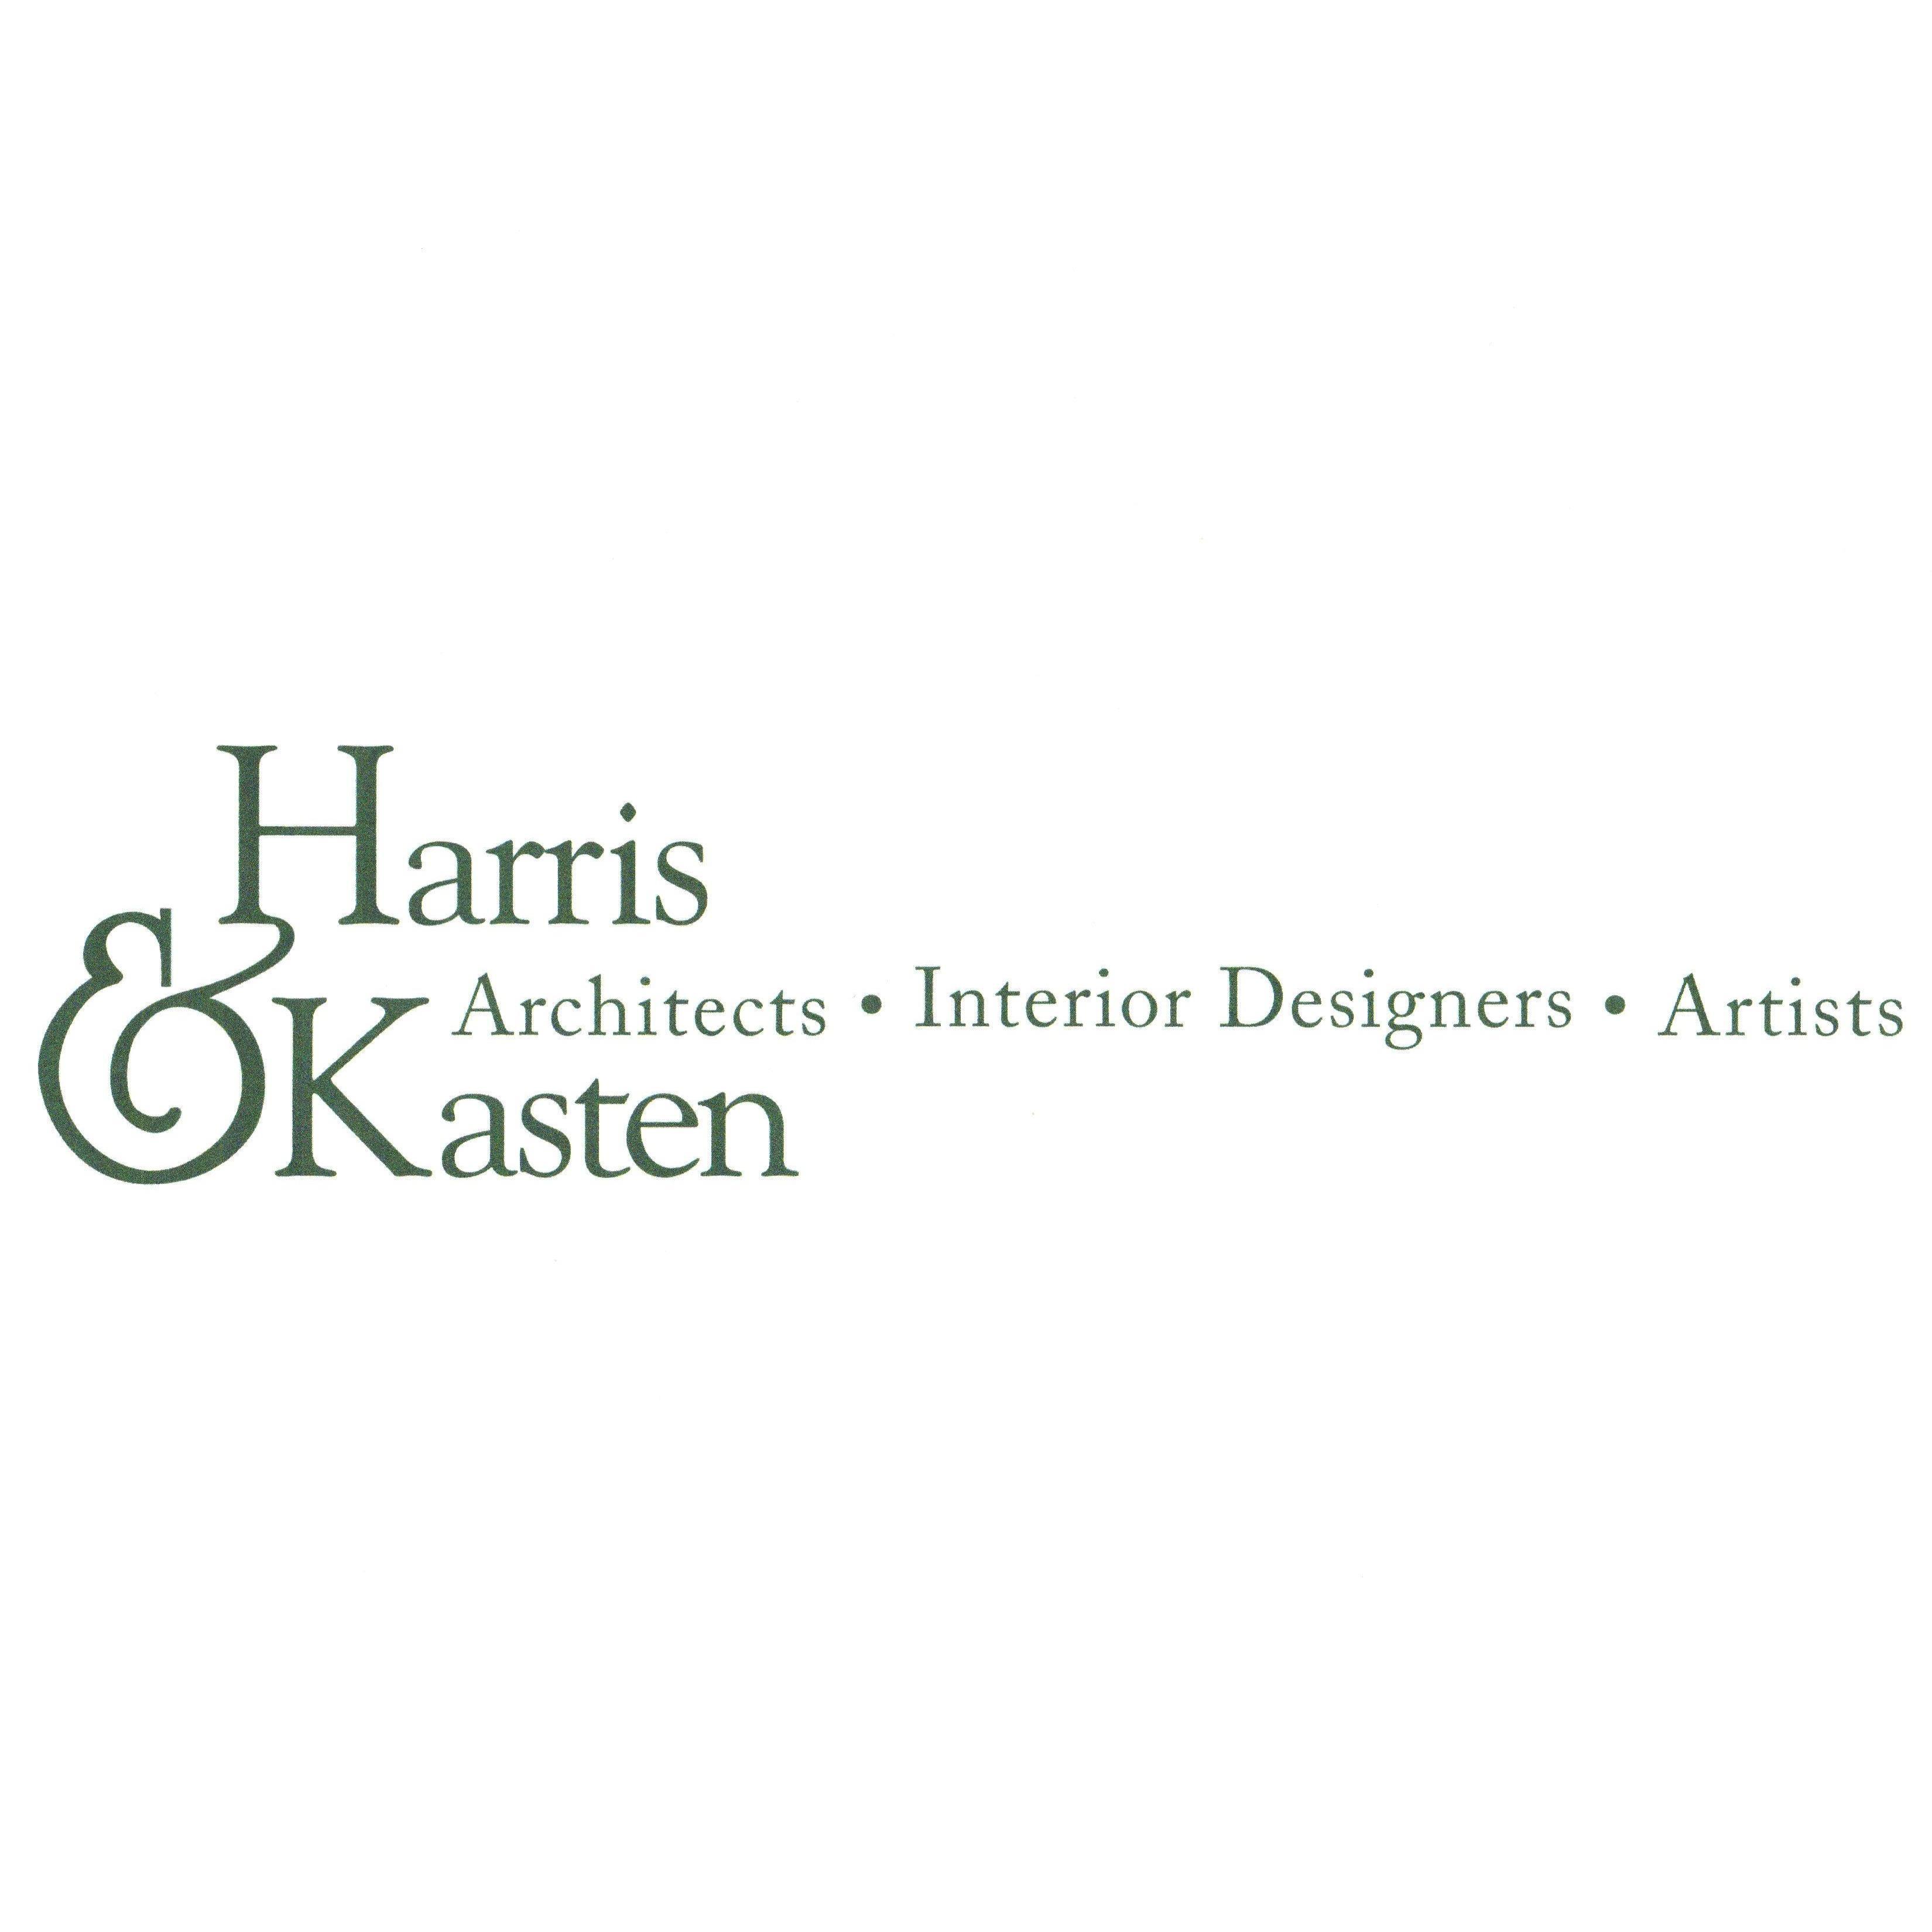 Harris & Kasten Incorporated